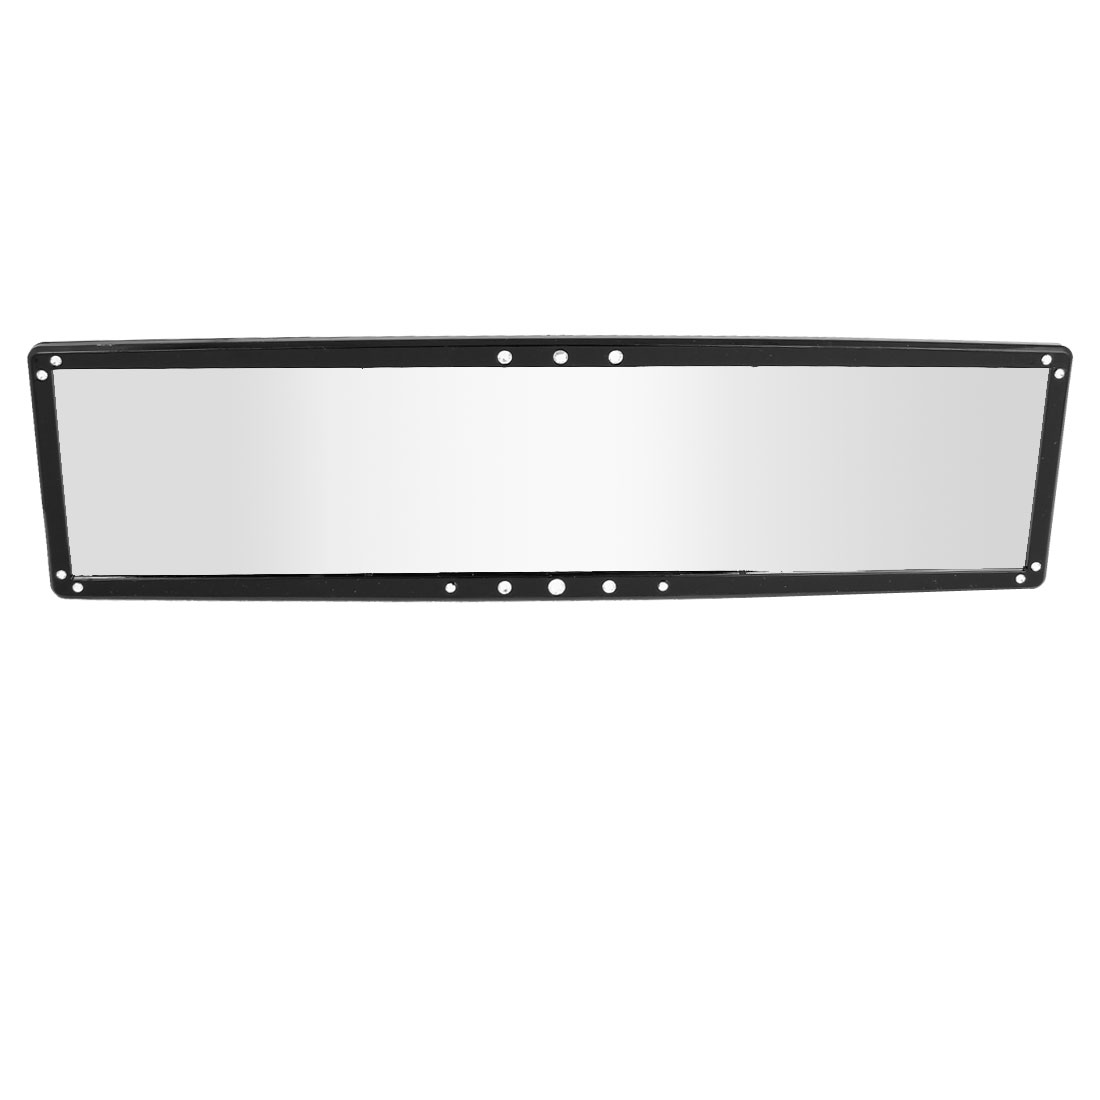 280mm Flat Plastic Rhinestone Decor Car Interior Rear View Mirror Black